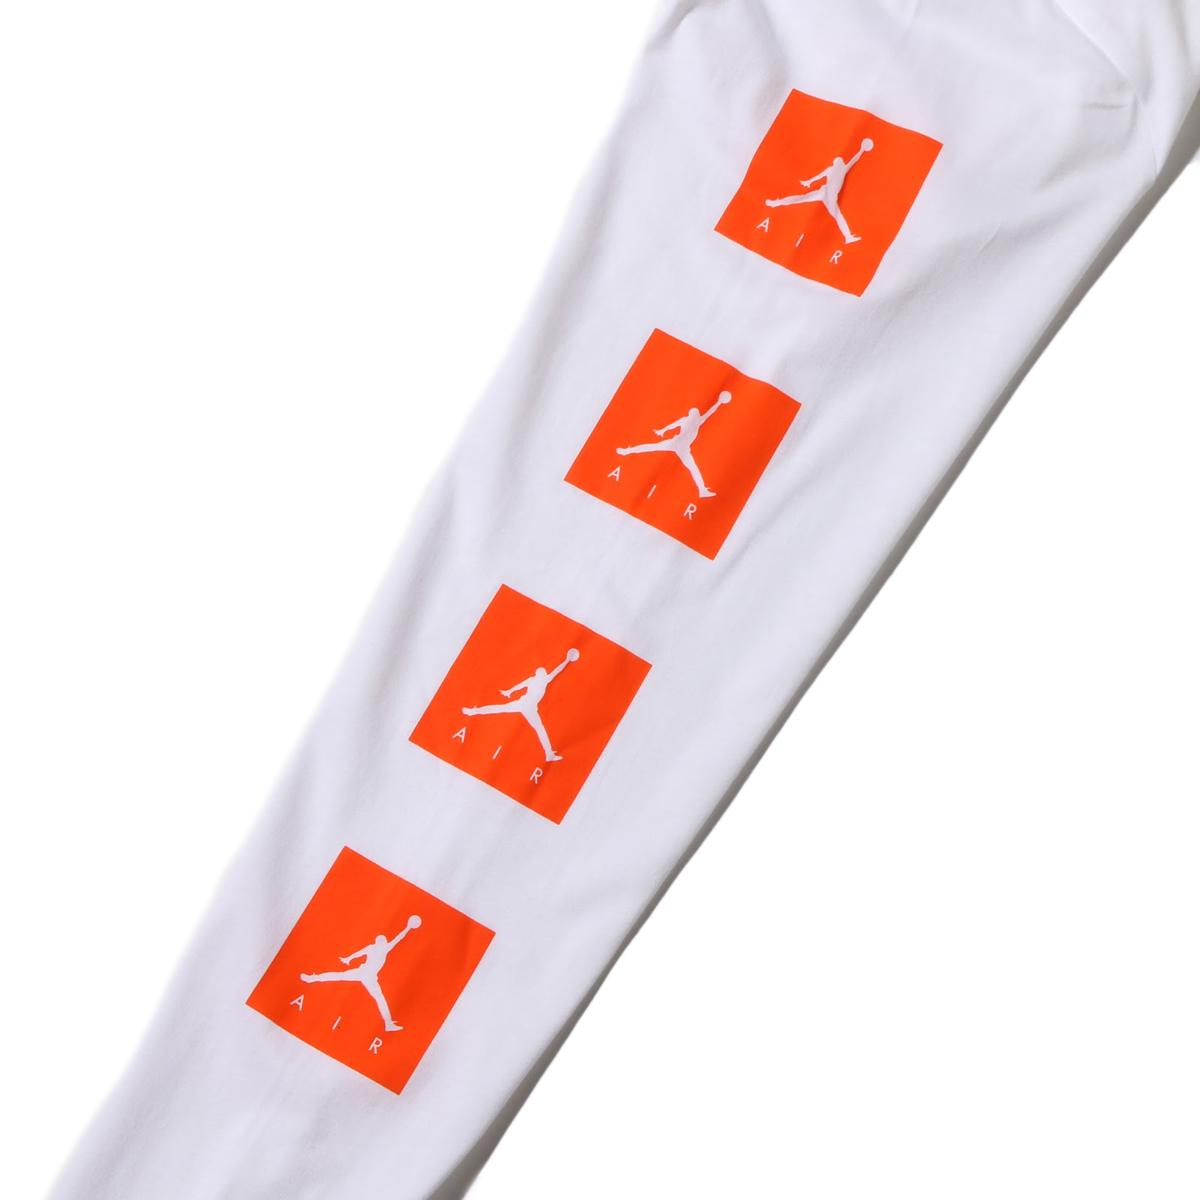 b195e93aaf09 NIKE M JSW LS TEE BE LIKE MIKE VRBG (Nike Jordan like microphone Burbage  Longus Reeve T-shirt) (WHITE) 17HO-S